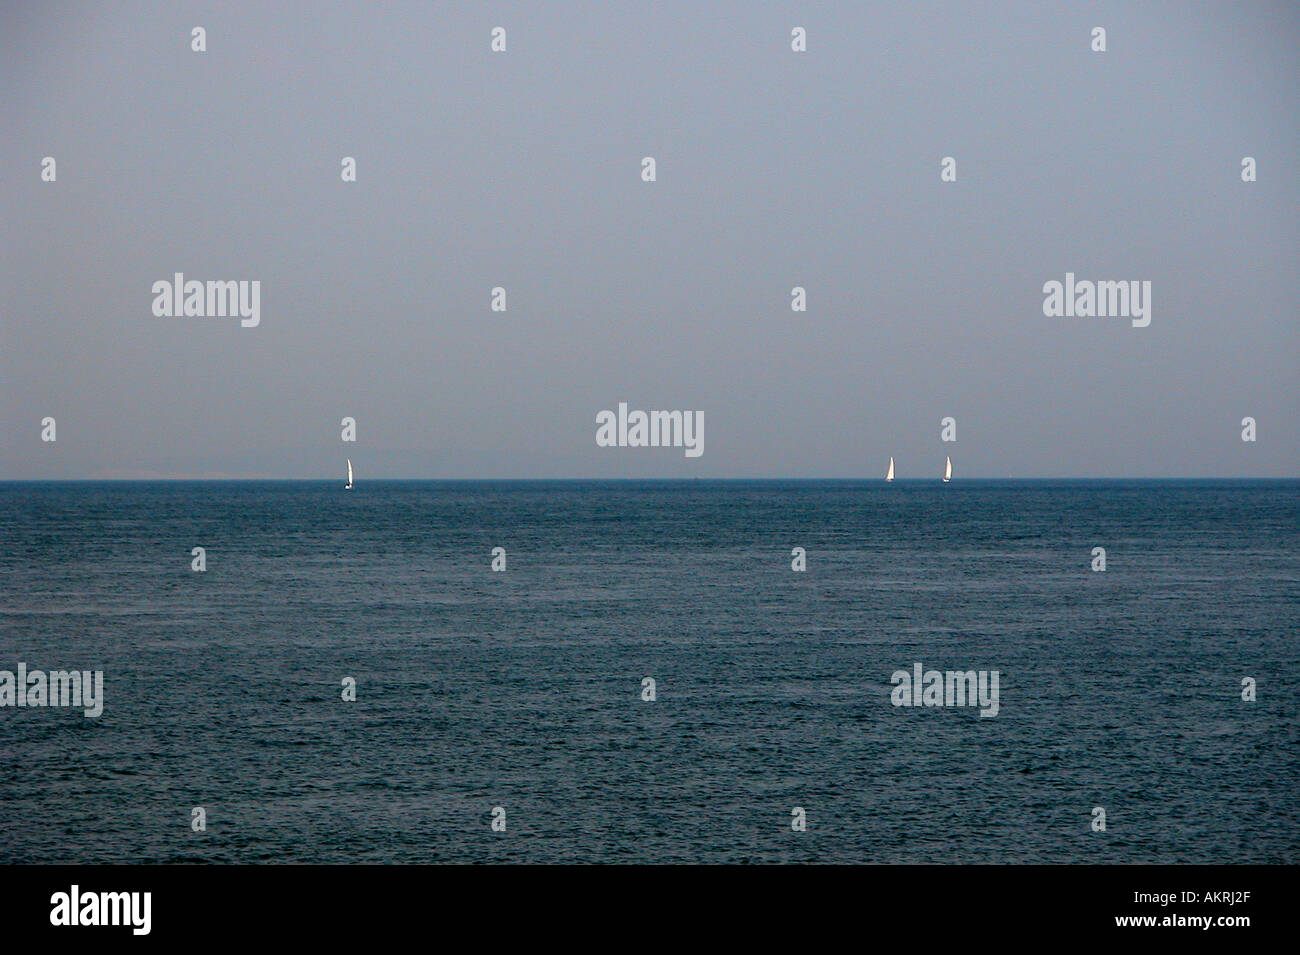 Sailing in Solent Dorset England - Stock Image